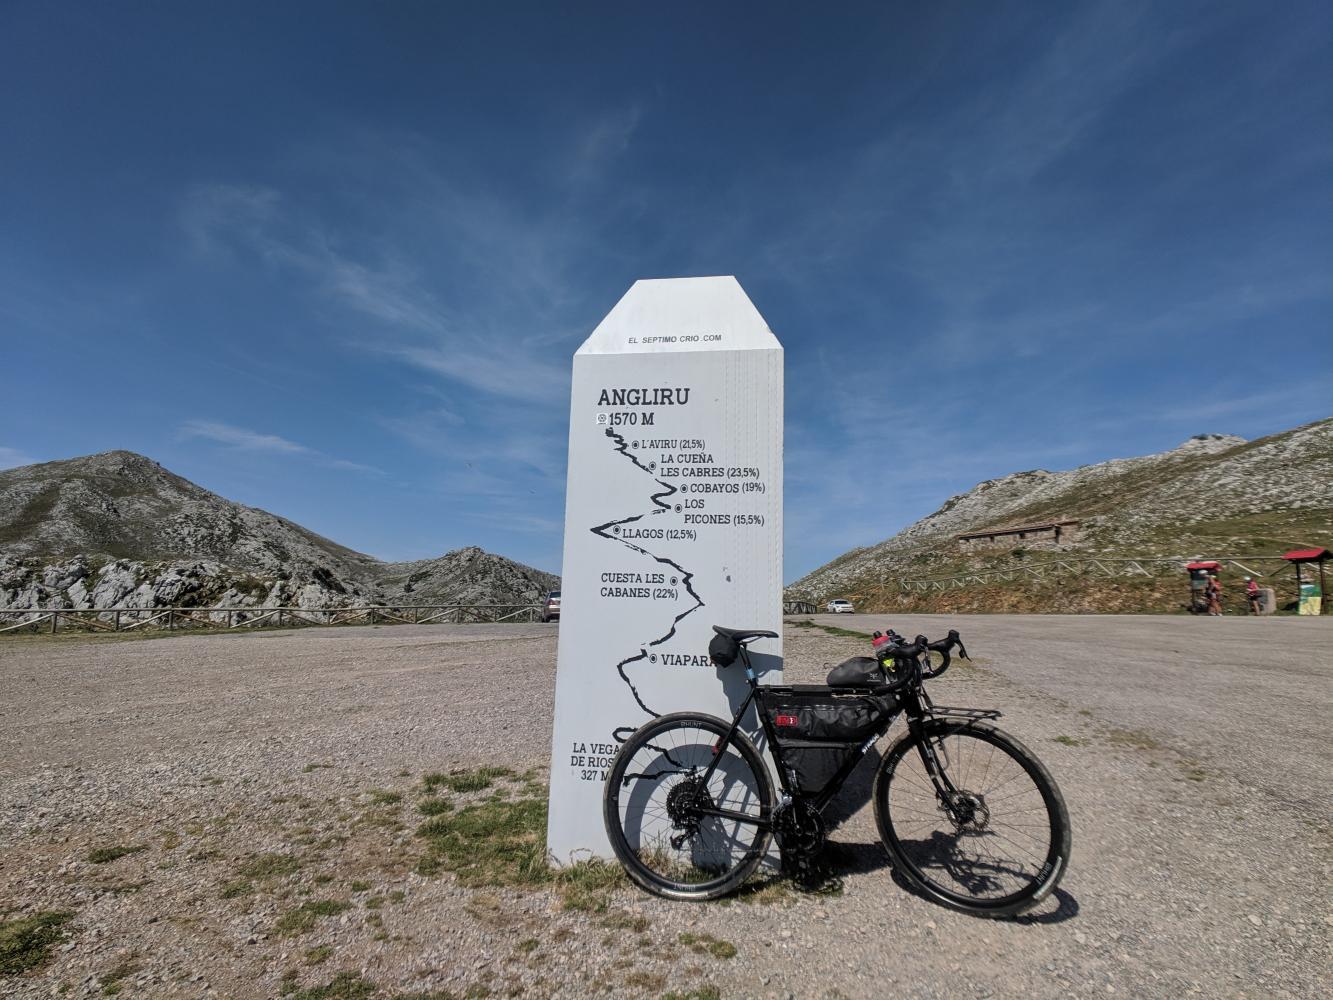 Alto de l'Angliru Bike Climb - PJAMM Cycling